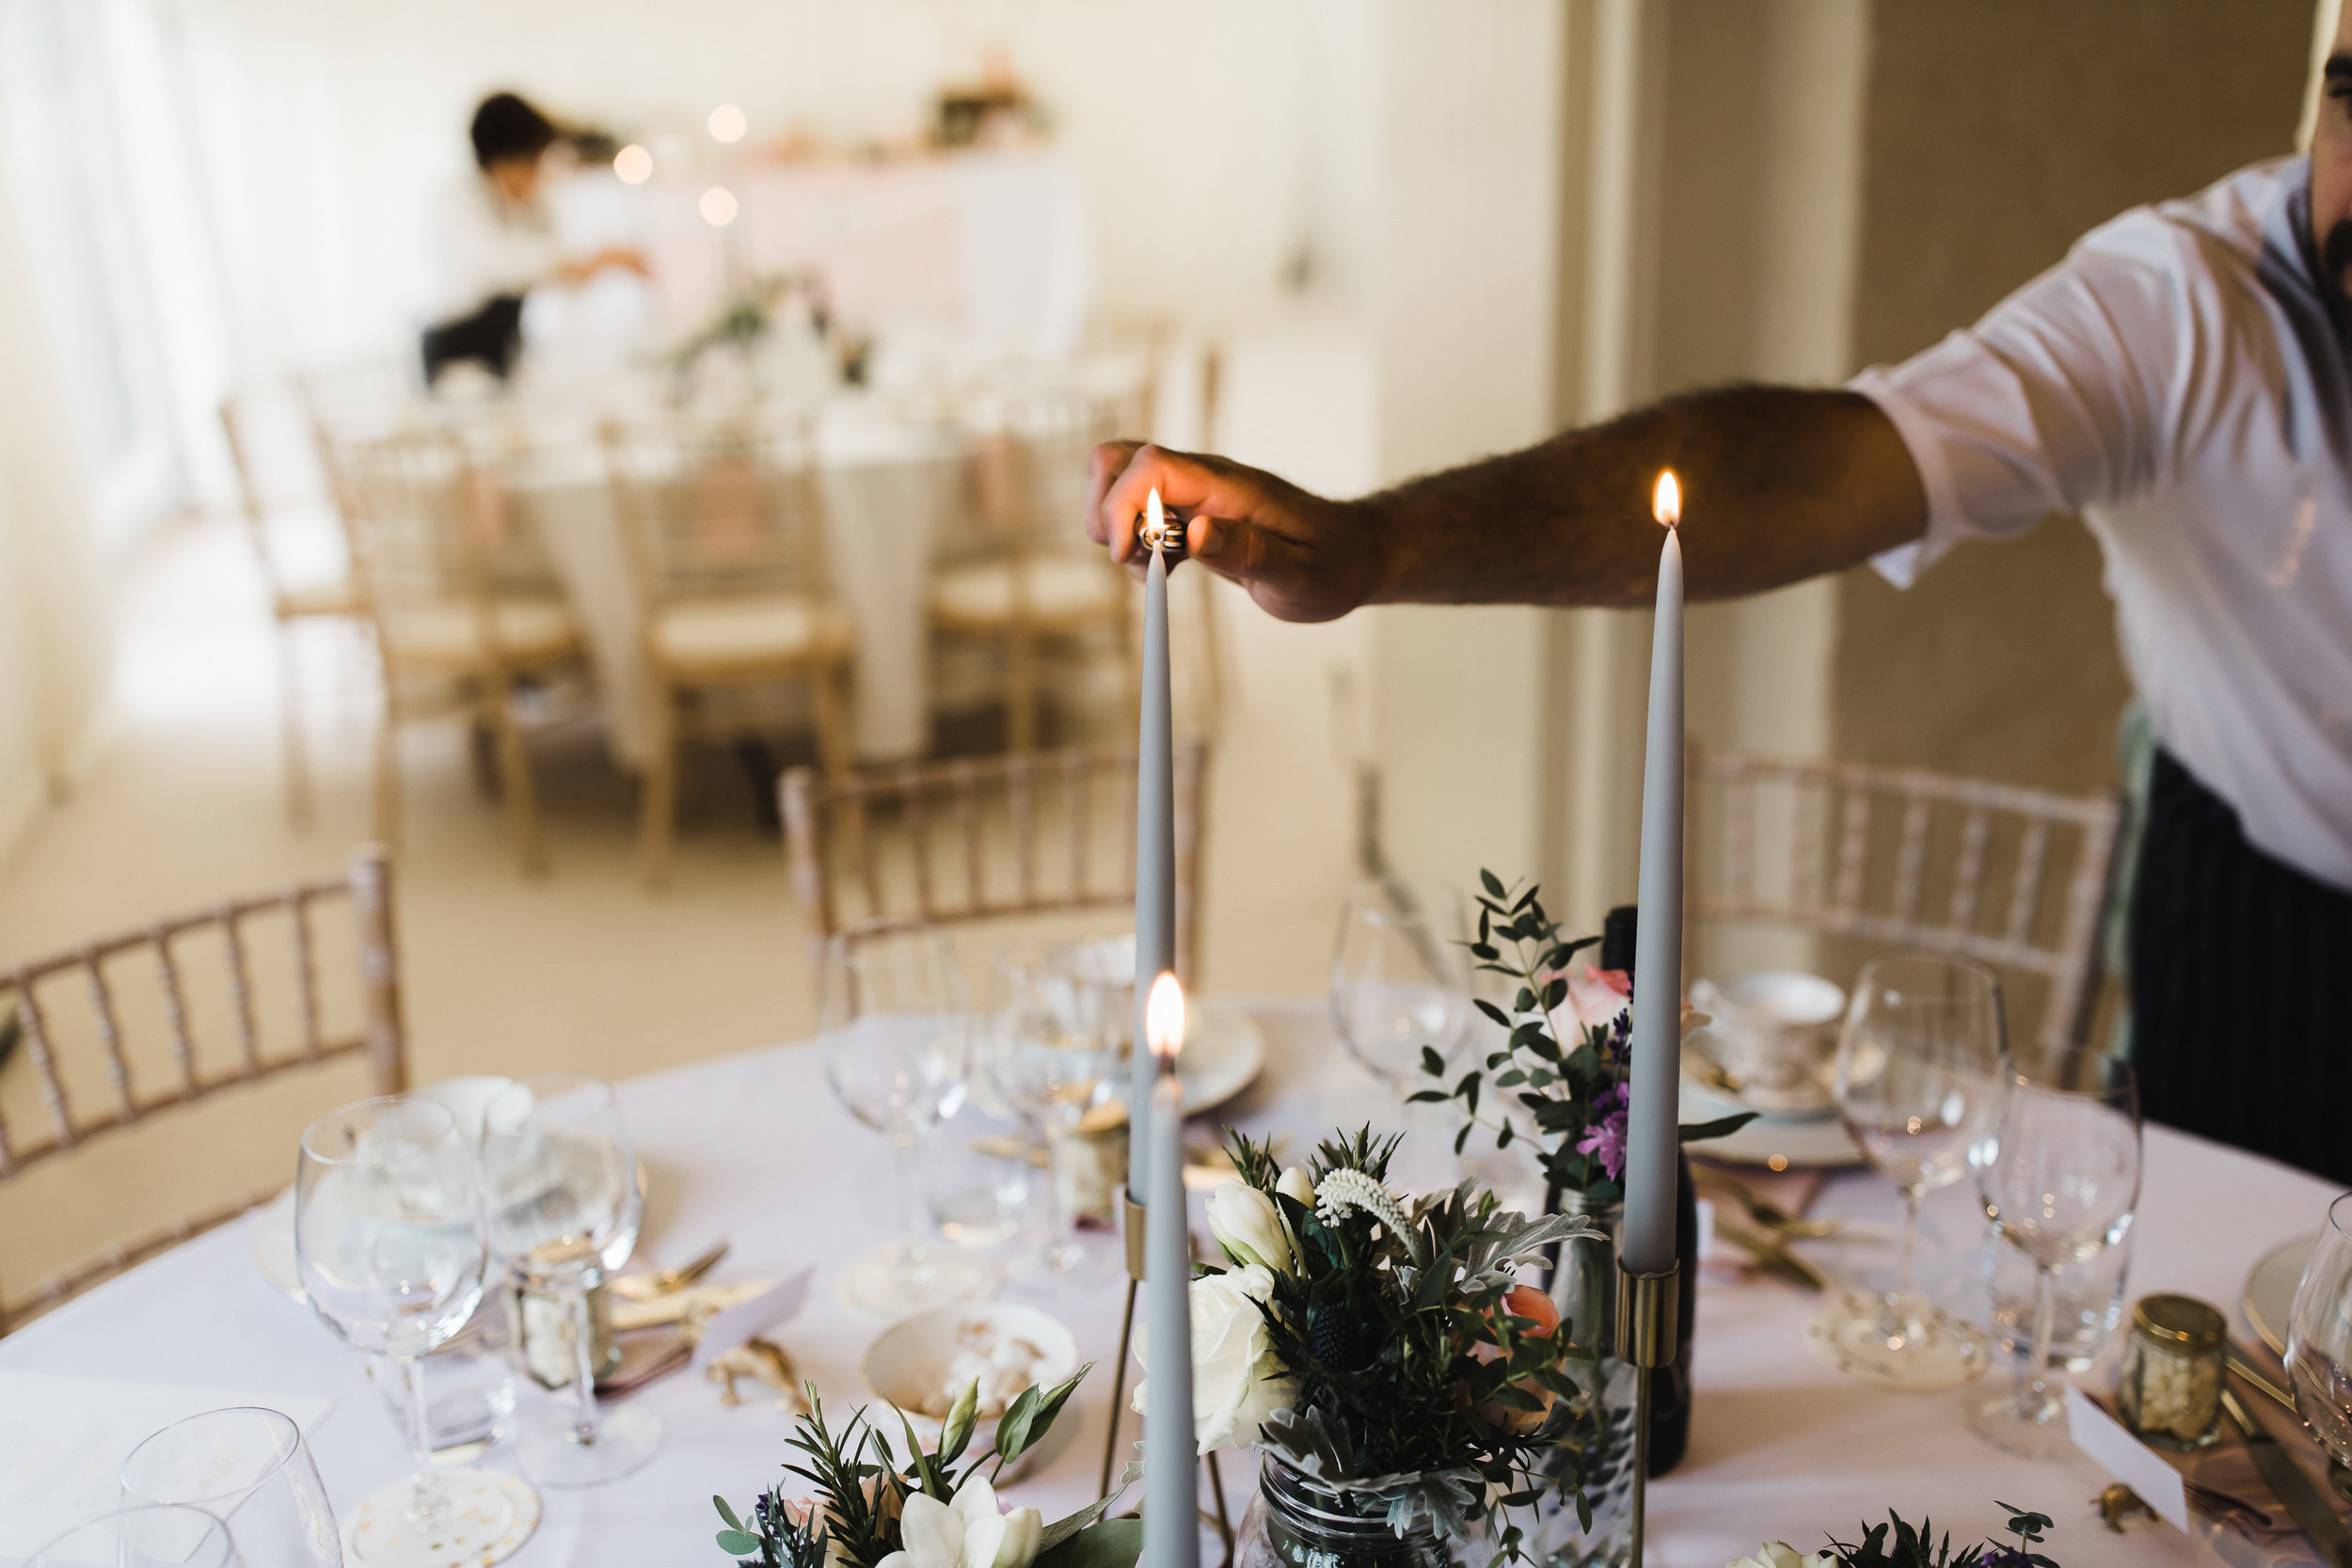 Nether_Wichendon_House_Wedding_037.jpg